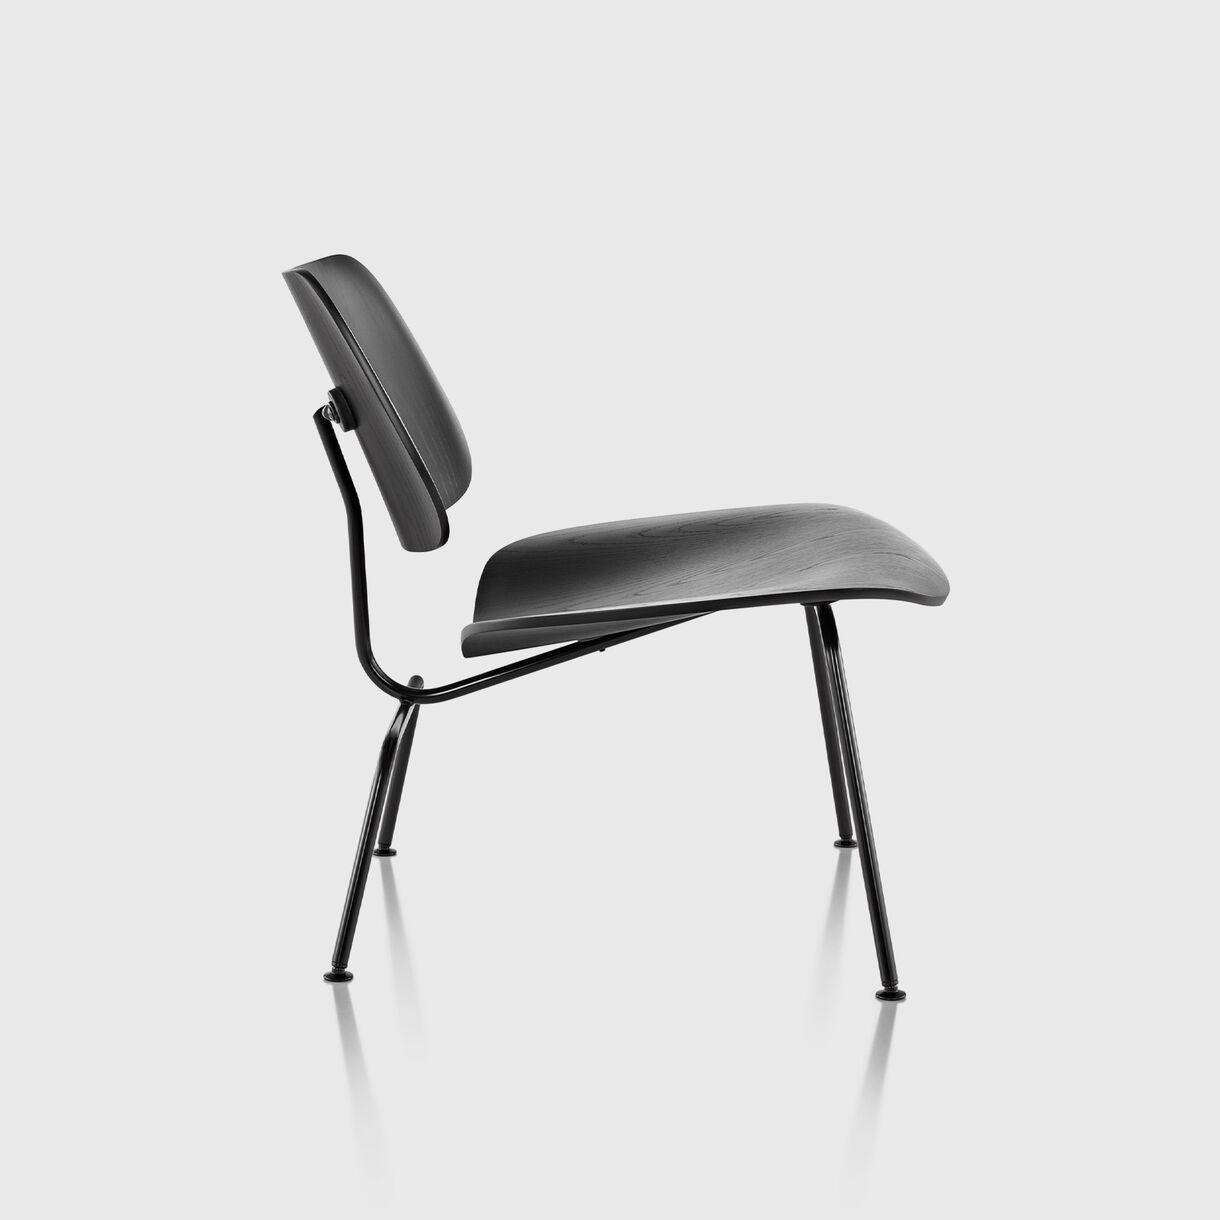 Eames Moulded Plywood Lounge Chair, Metal Base, Ebony & Black